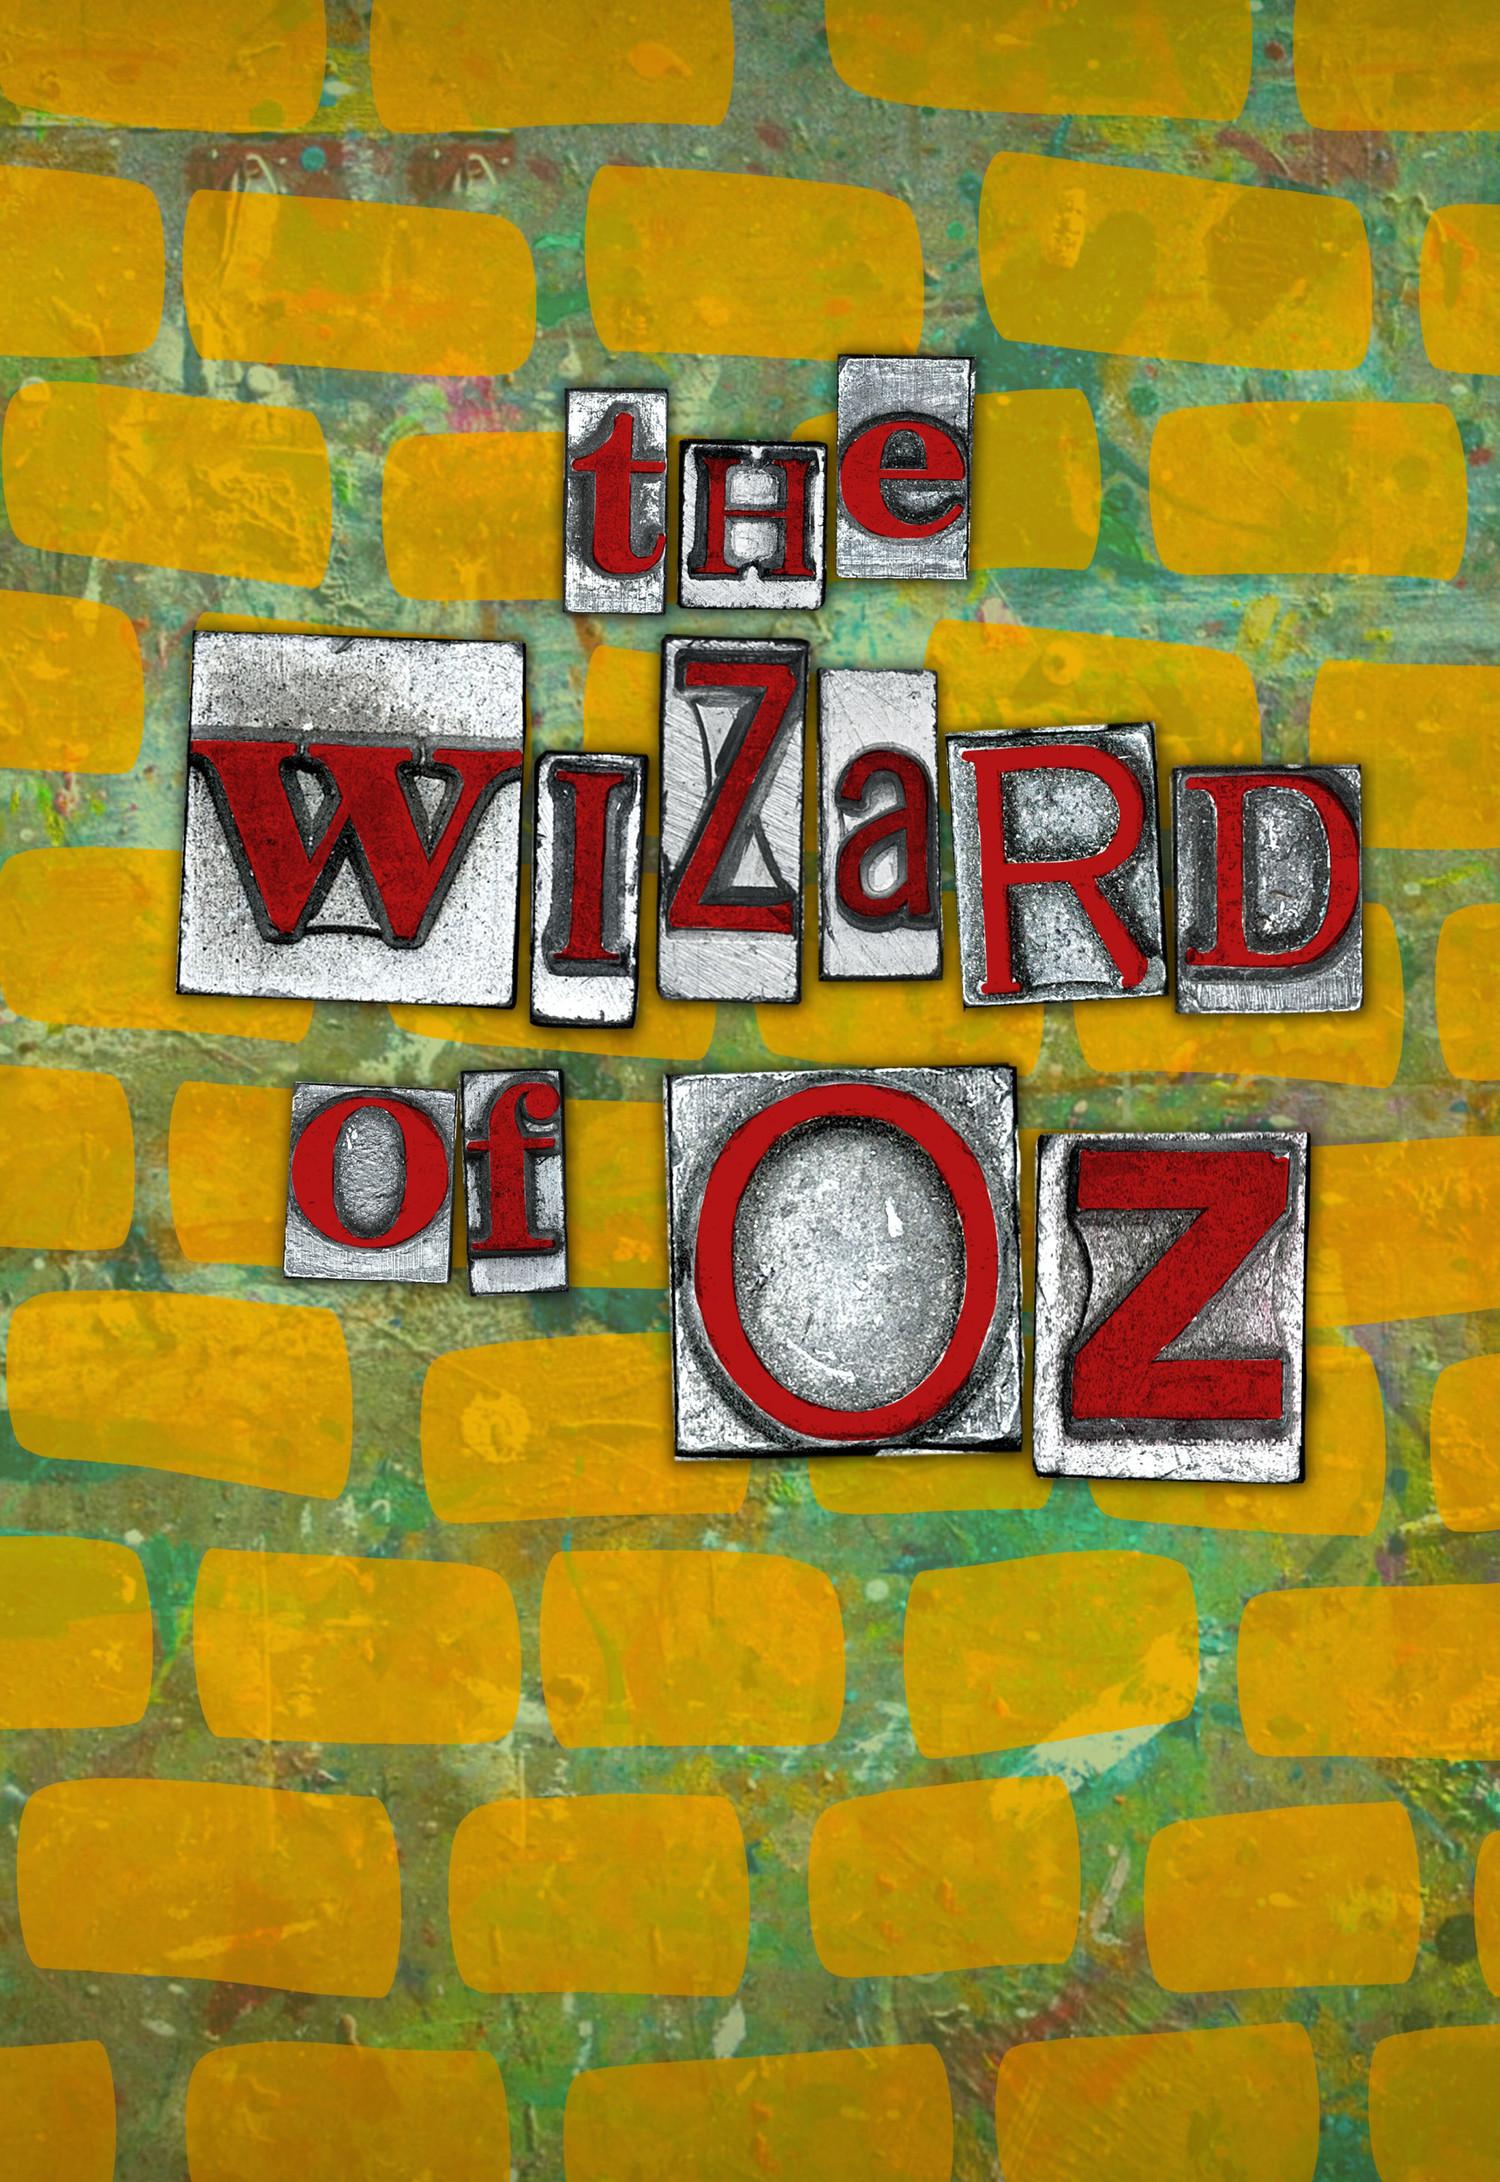 BWW Interview: Follow the Bluegrass Brick Road! Niki Badua Previews THE WIZARD OF OZ at The Alliance Theatre